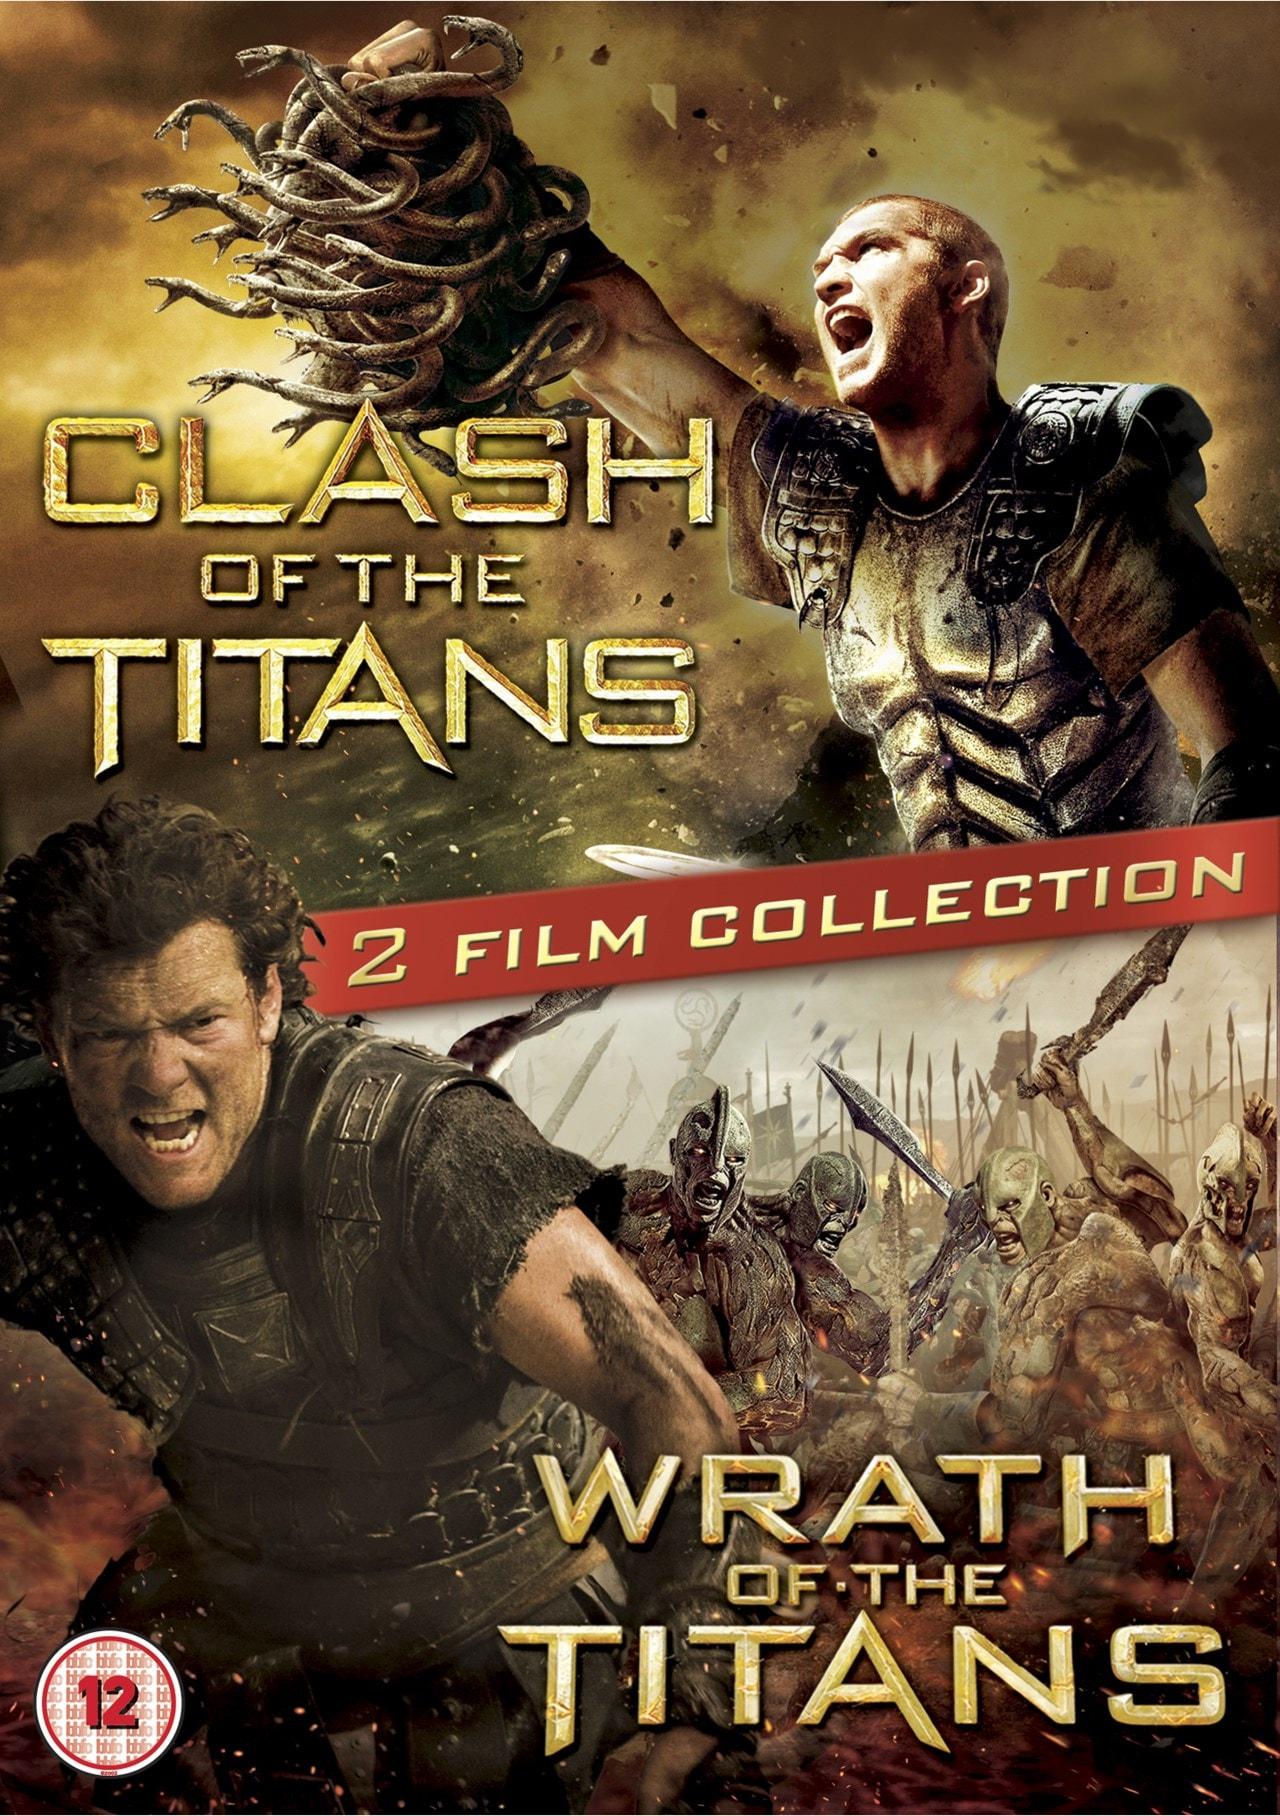 Clash of the Titans/Wrath of the Titans - 1